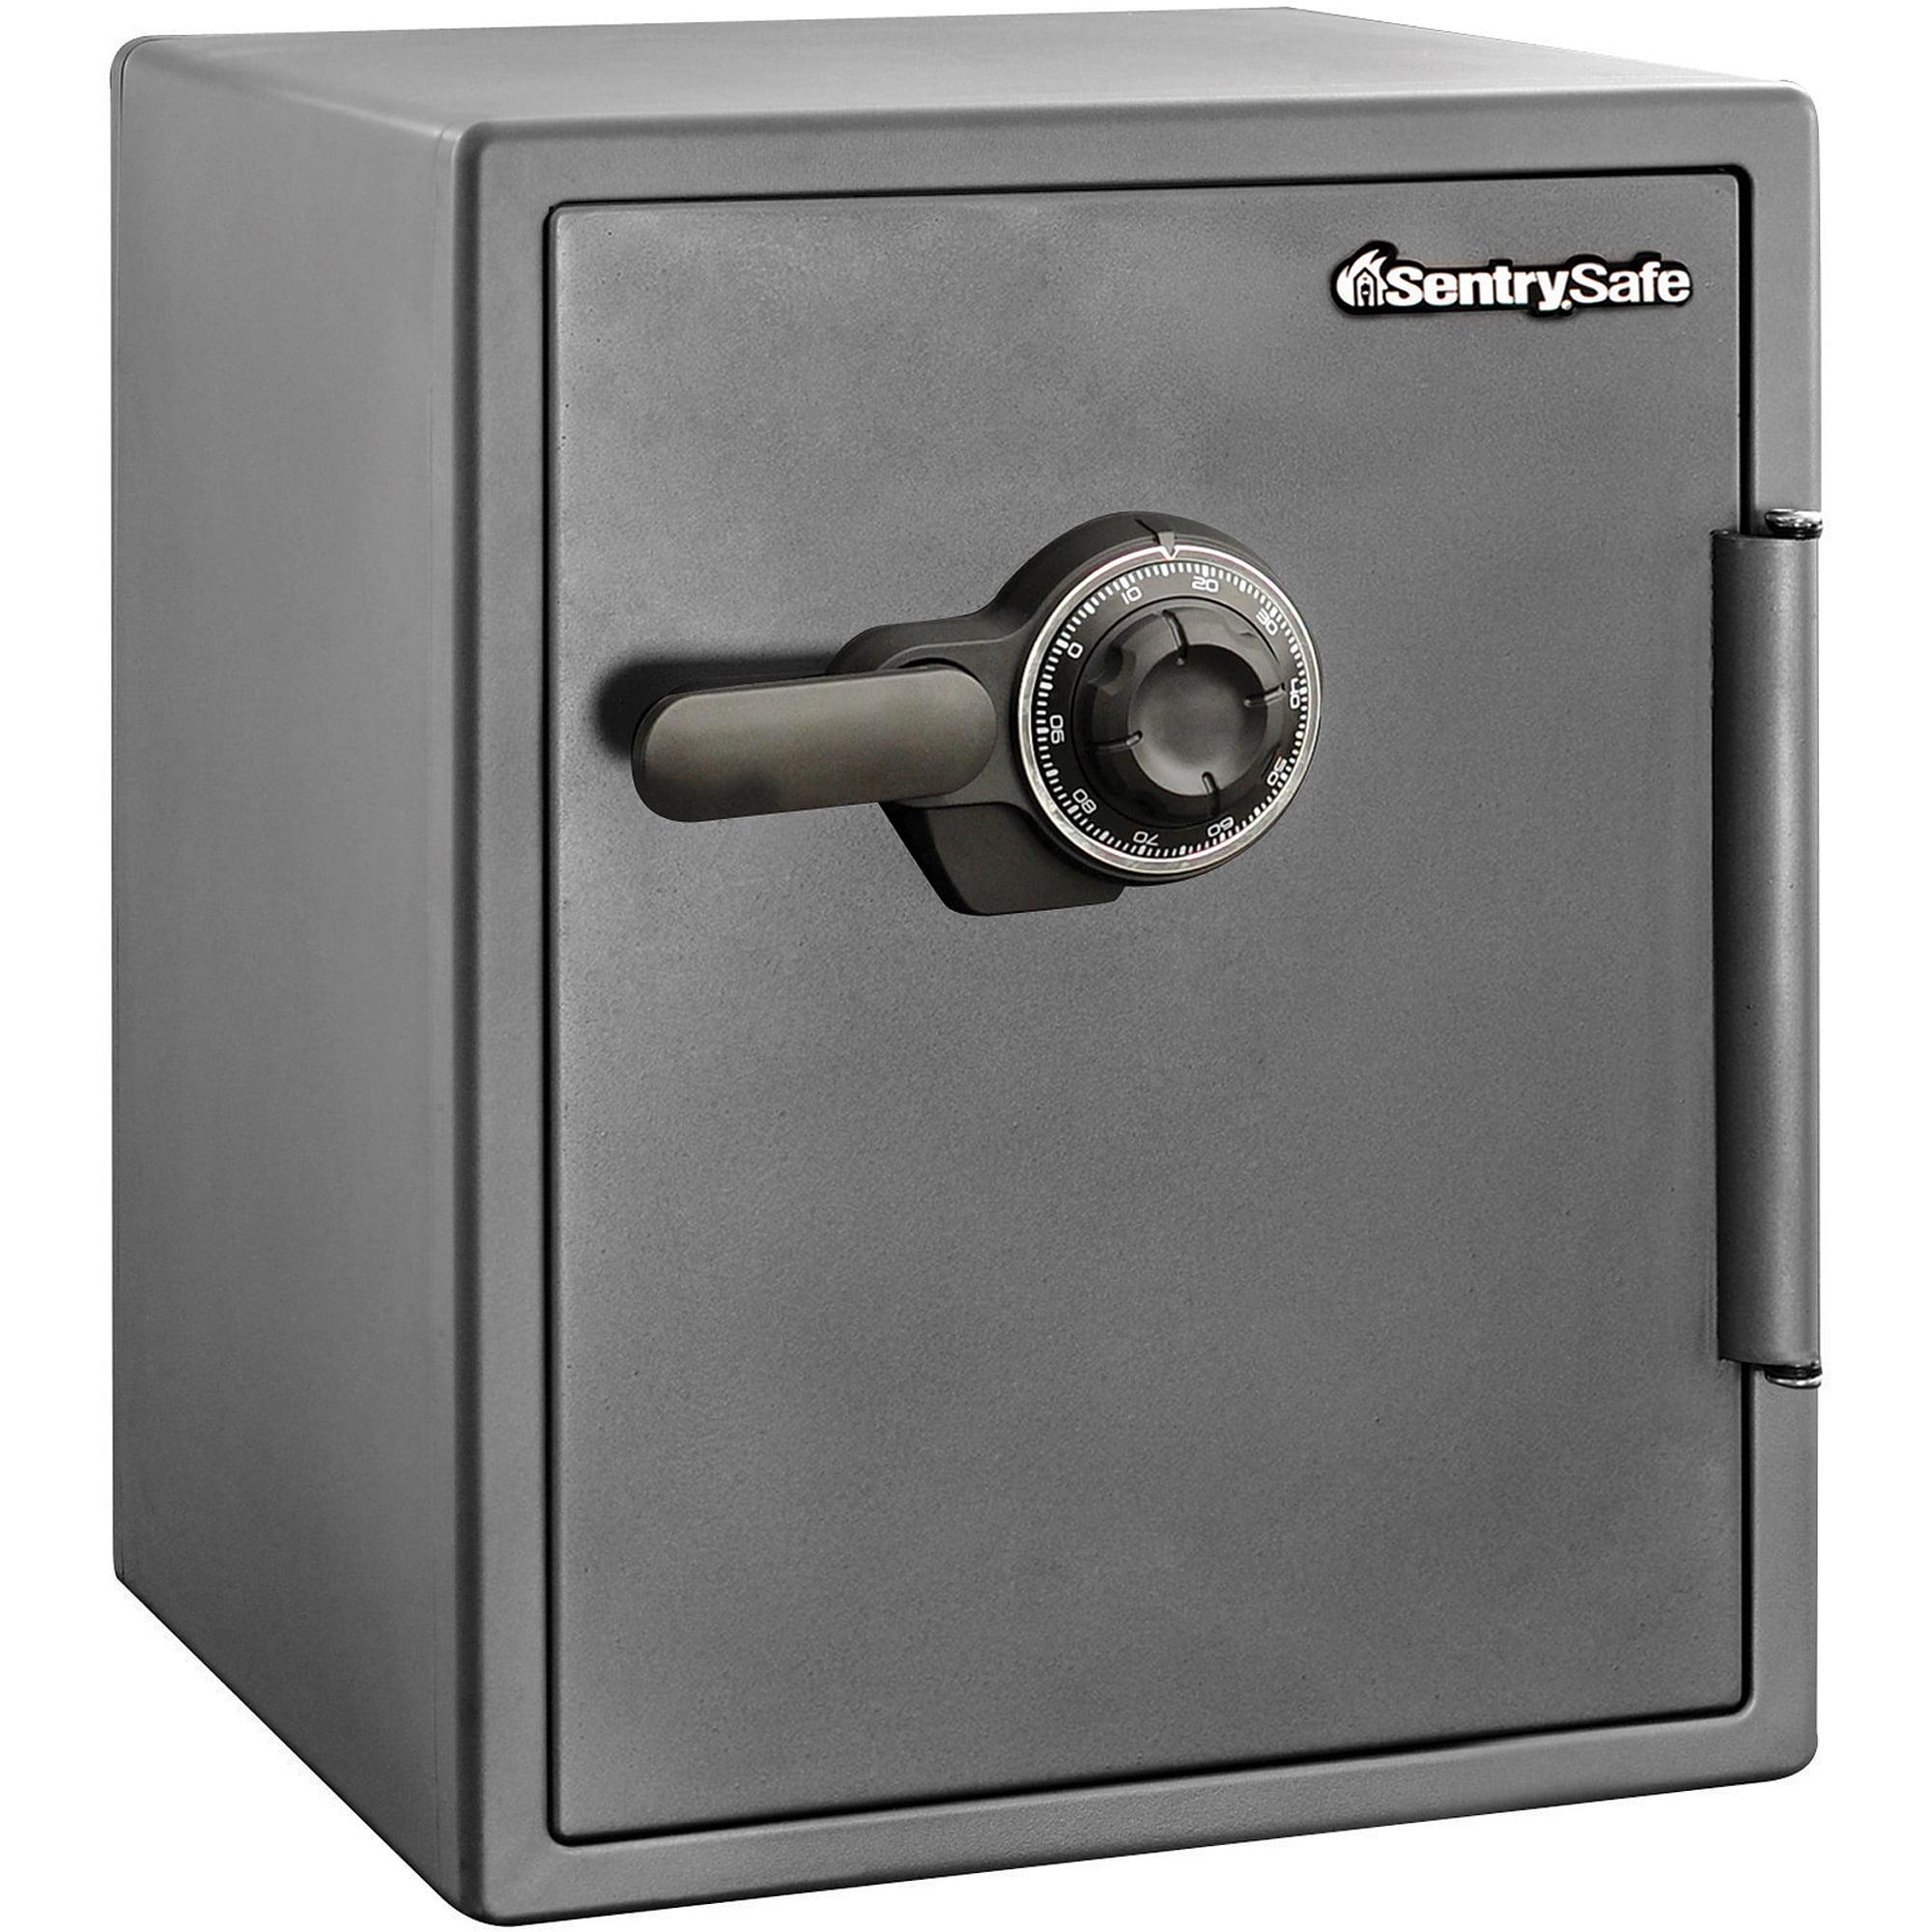 SentrySafe SF205CV Fireproof Safe with Combination Lock 2.0 cu ft